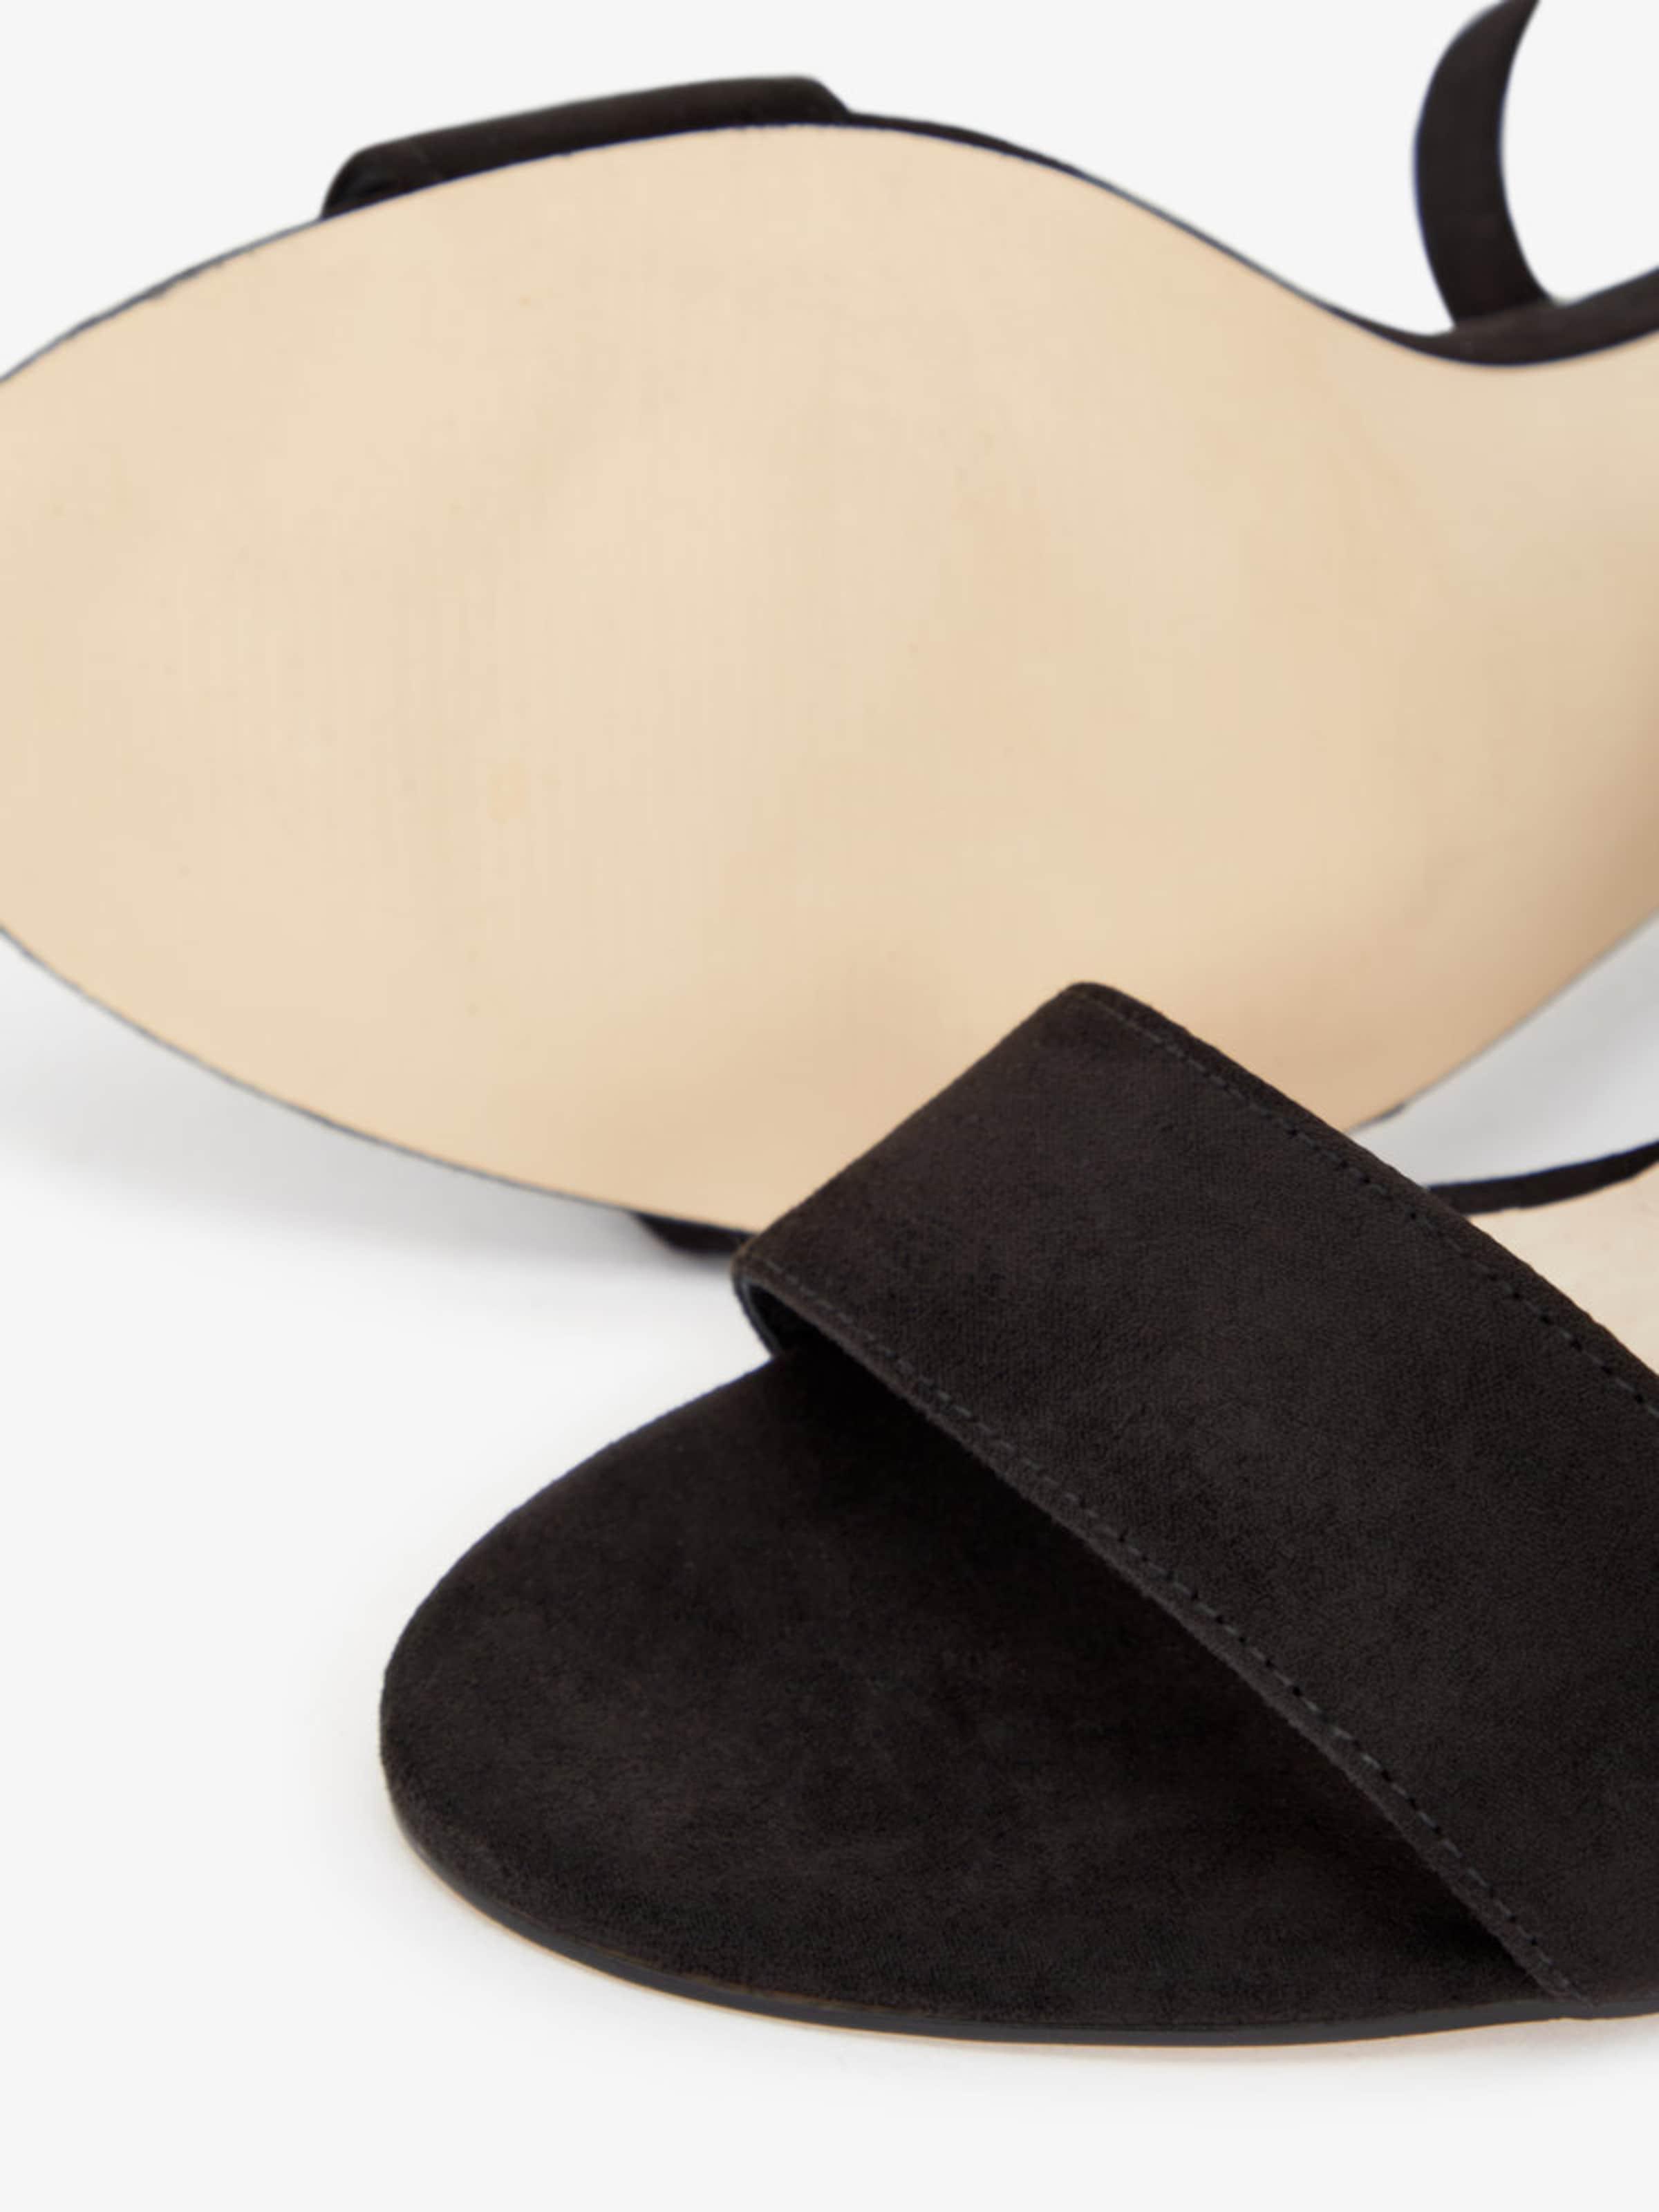 Bianco Sandalen Sandalen Sandalen Textil Bequem, gut aussehend 3170f1